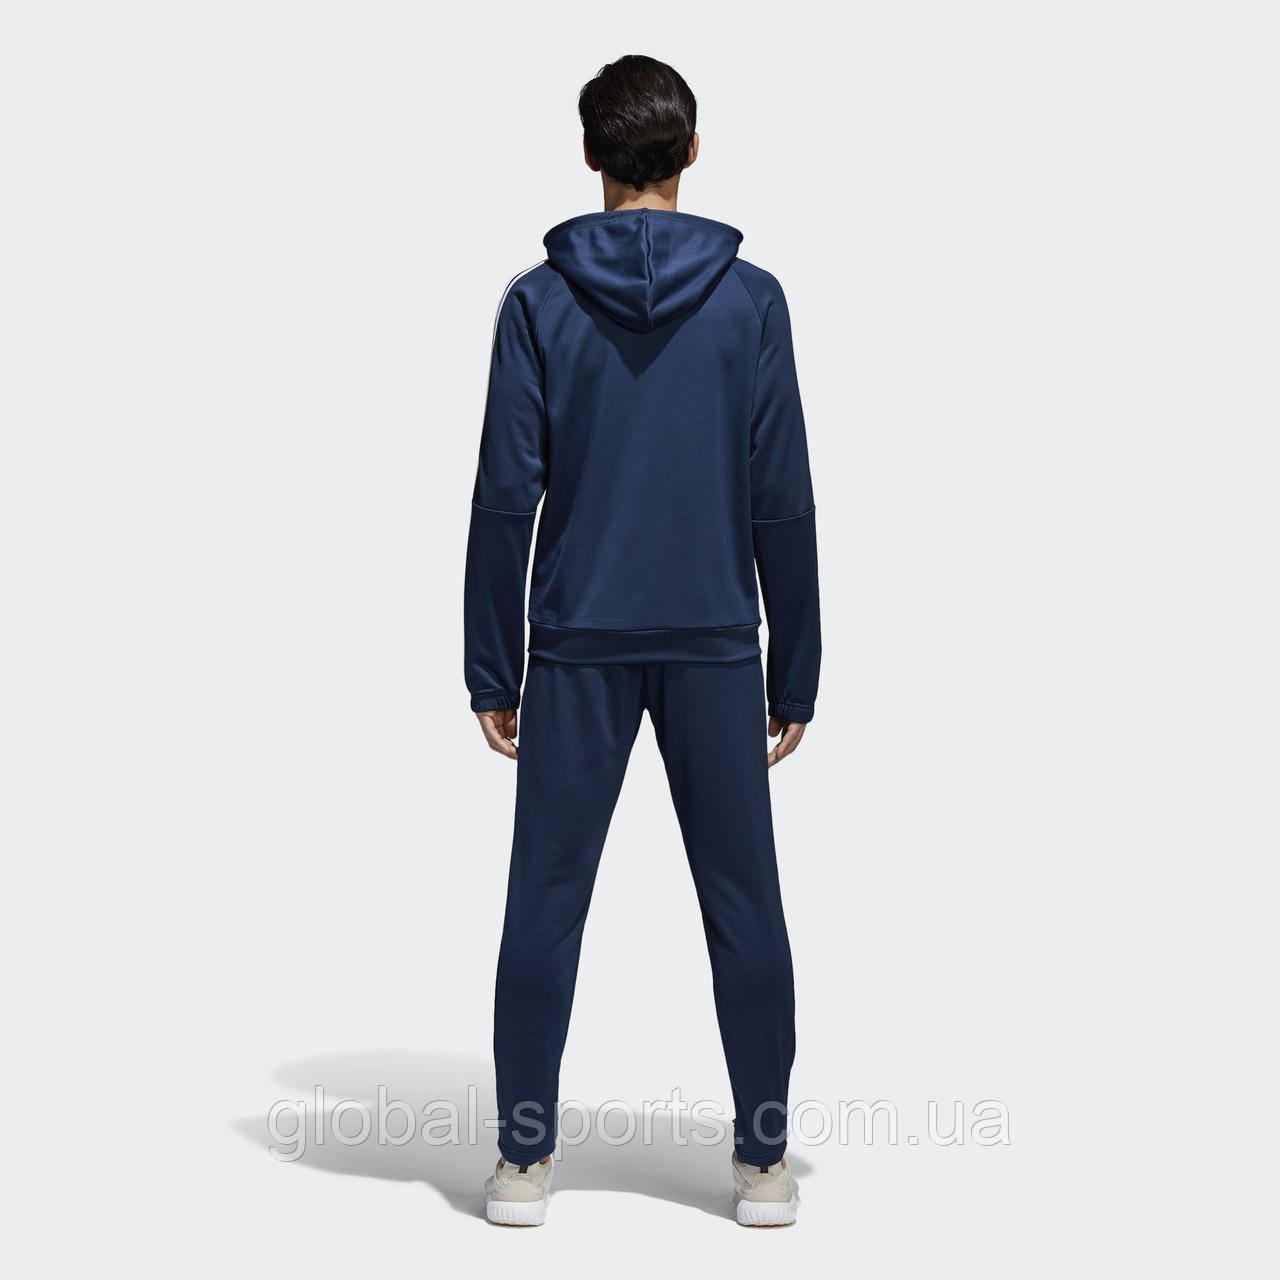 906b63f0 Мужской спортивный костюм Adidas Re-Focus (Артикул:CF1618): продажа ...